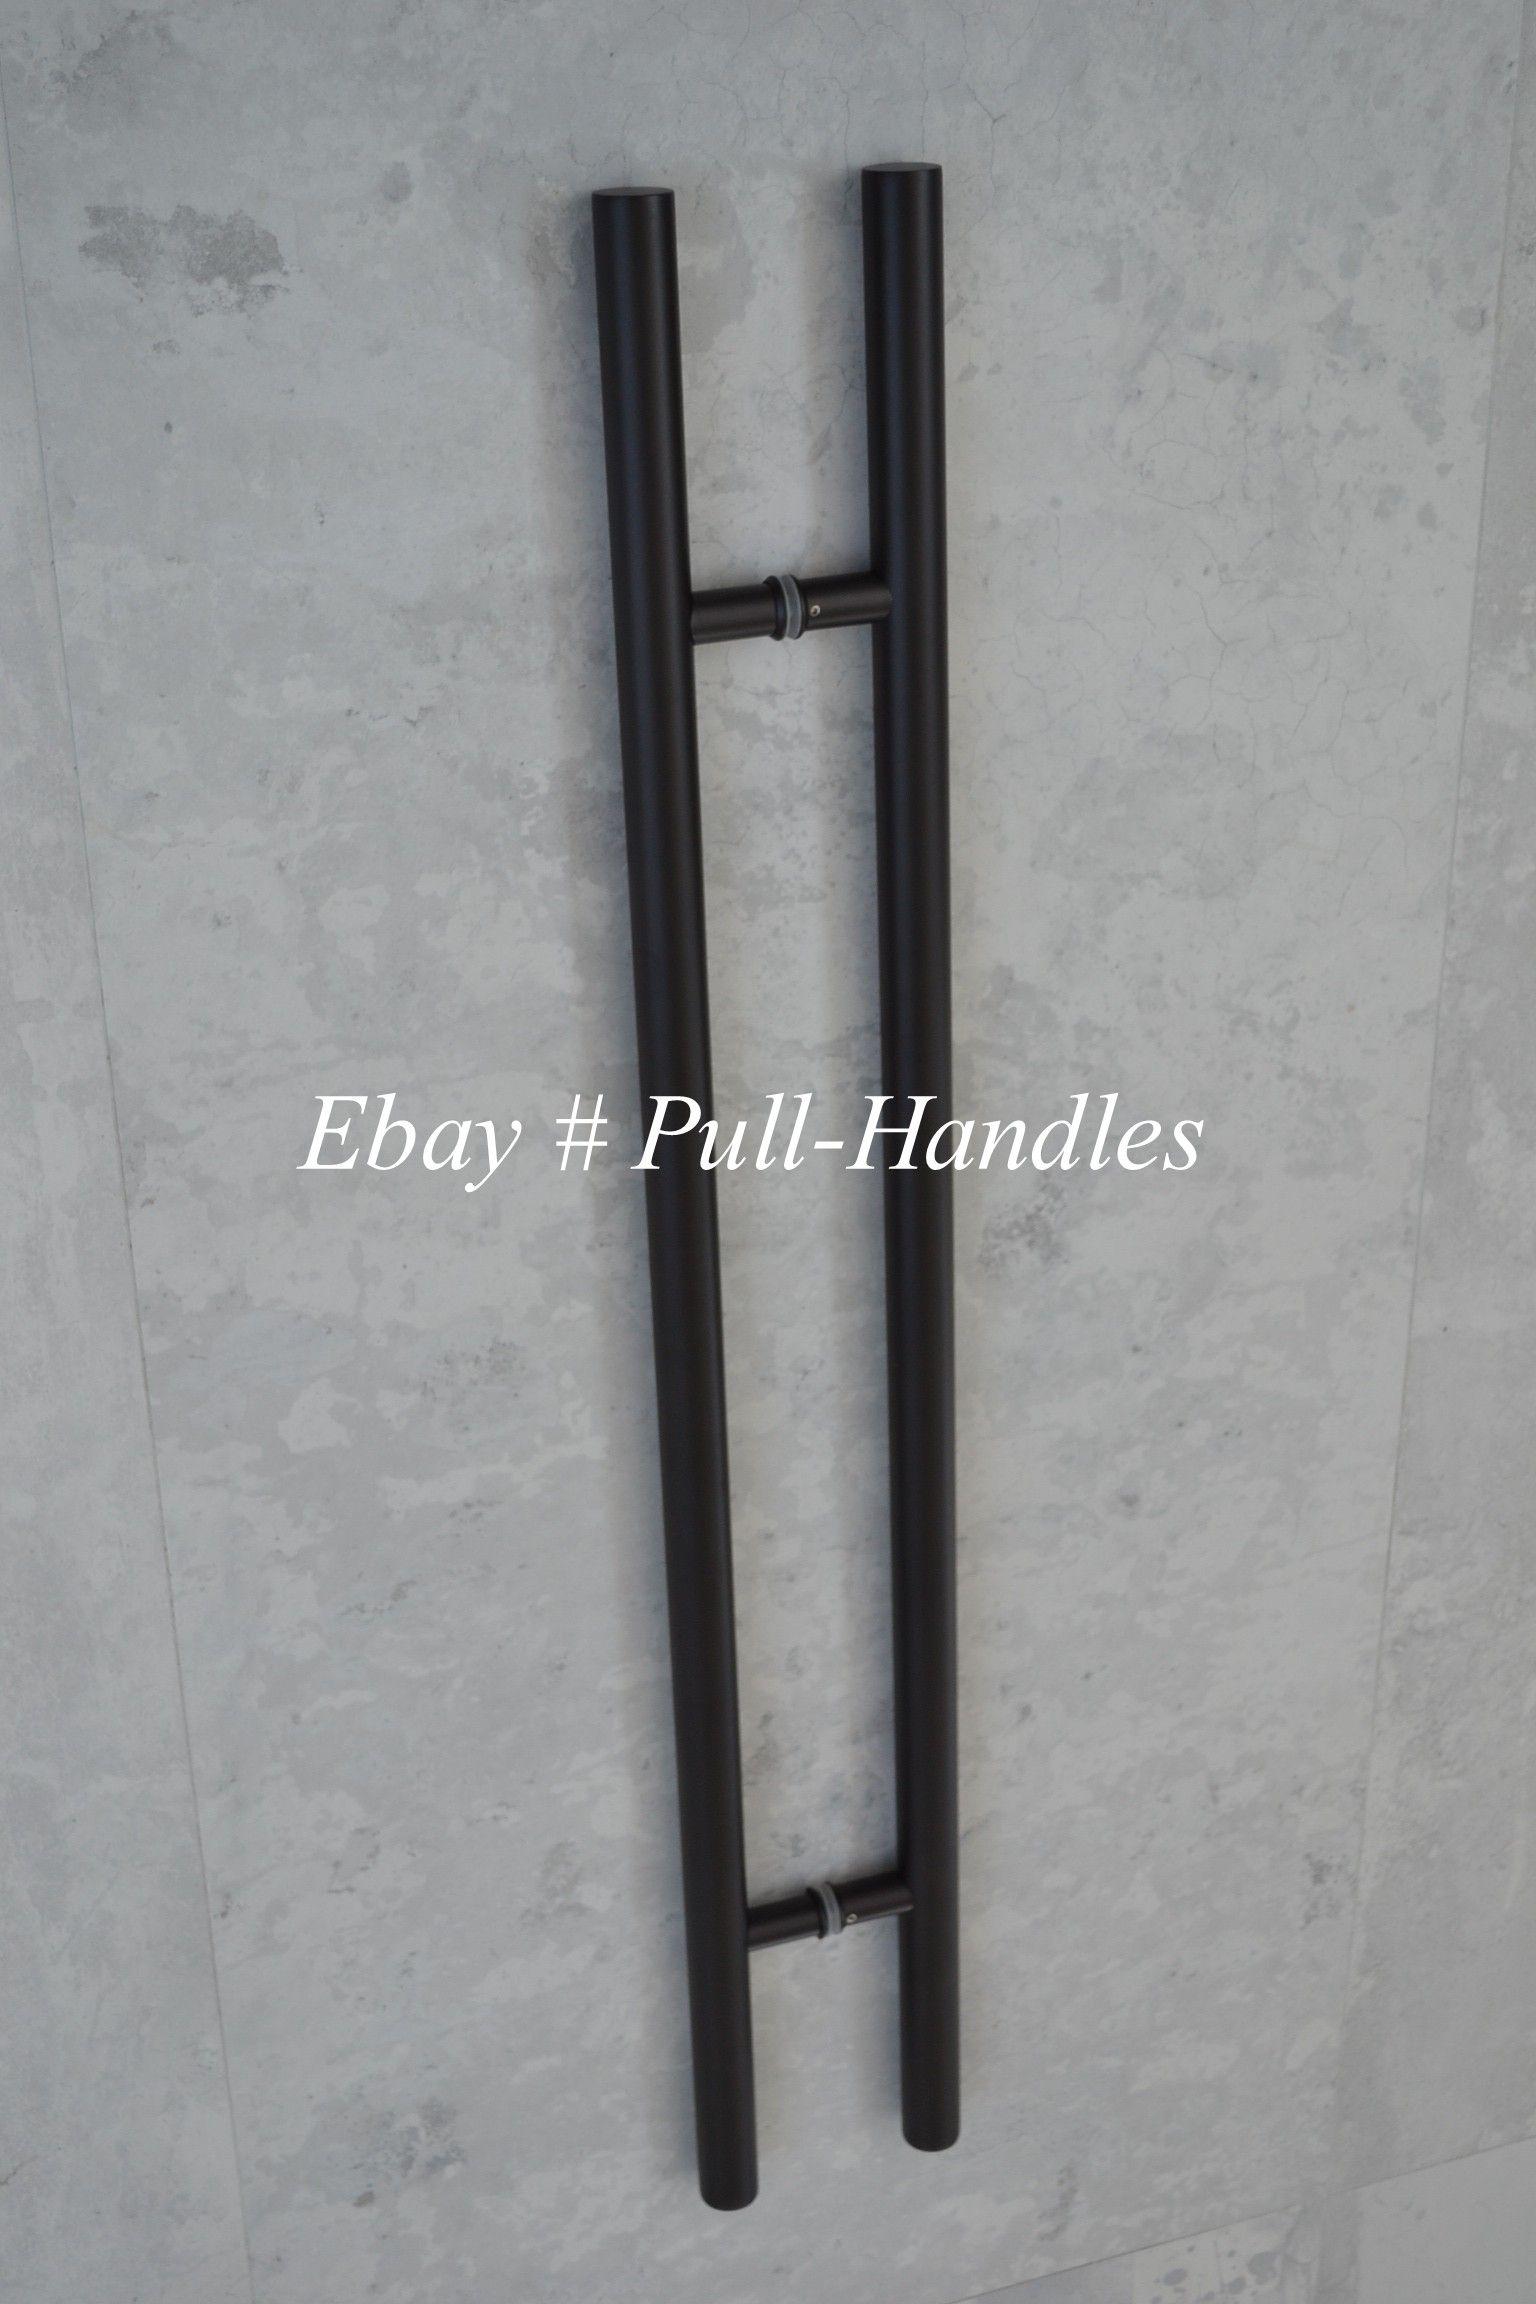 Chic modern contemporary black pull push handle for entry entrance chic modern contemporary black pull push handle for entry entrance glass door planetlyrics Choice Image